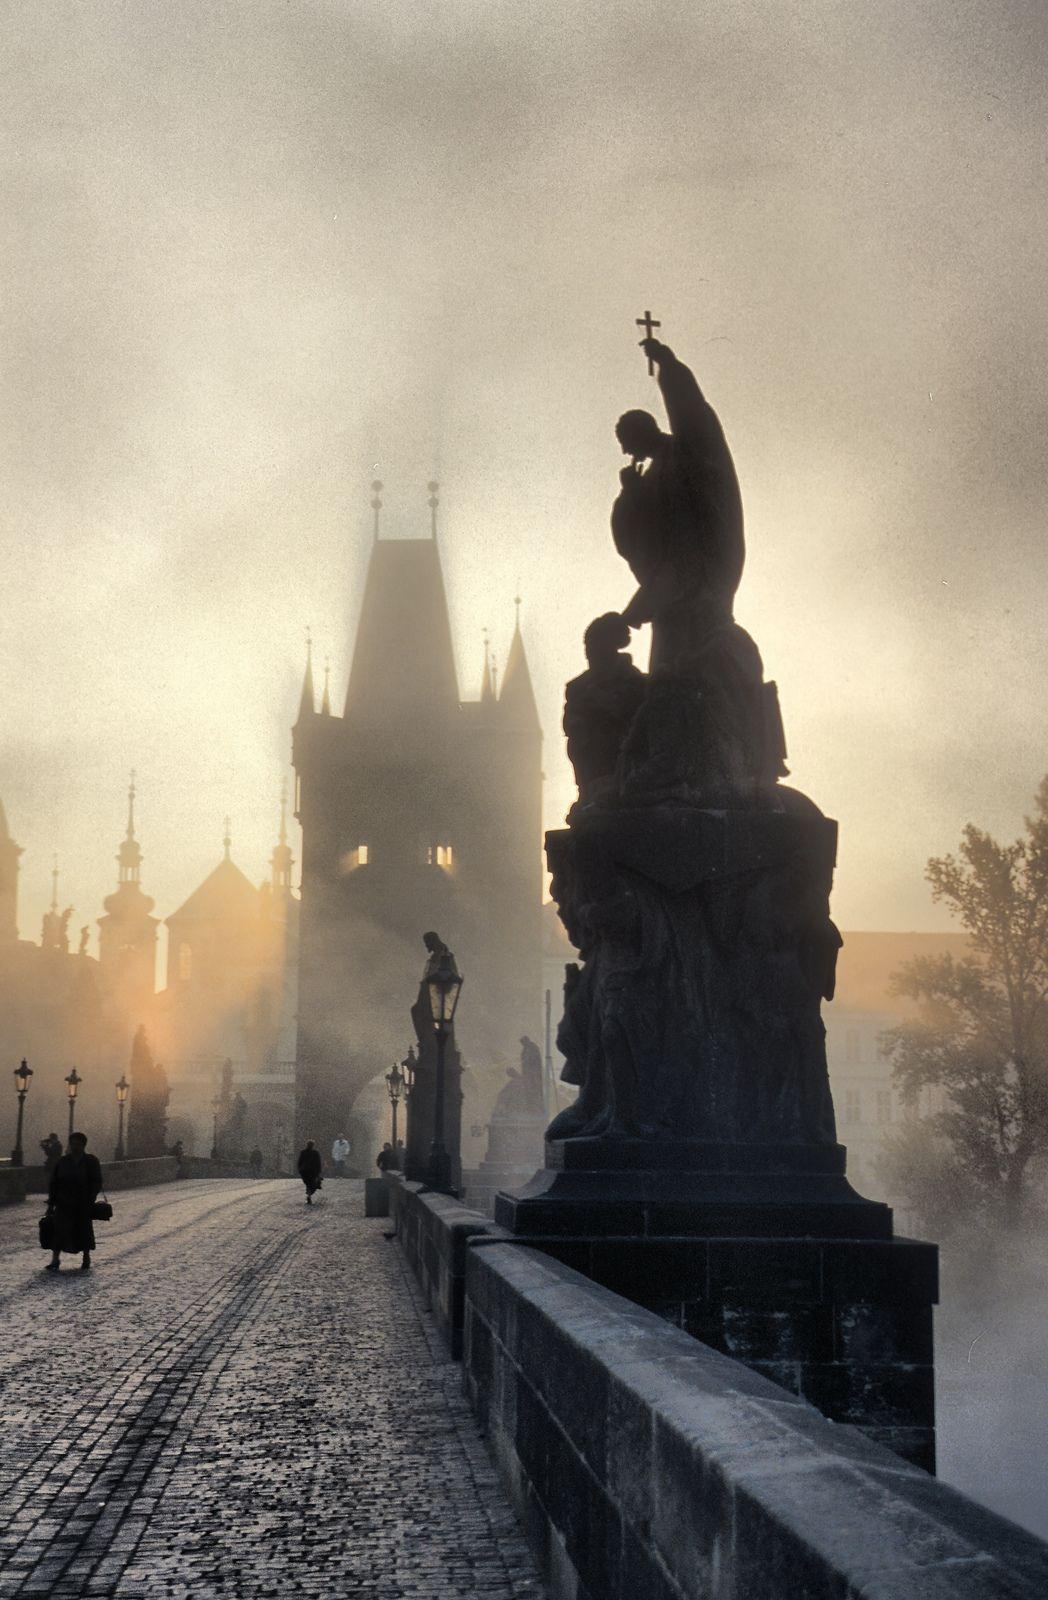 """Prague, Czech Republic"" by Neal J. Wilson on Flickr - Charles Bridge in Prague, Czech Republic"